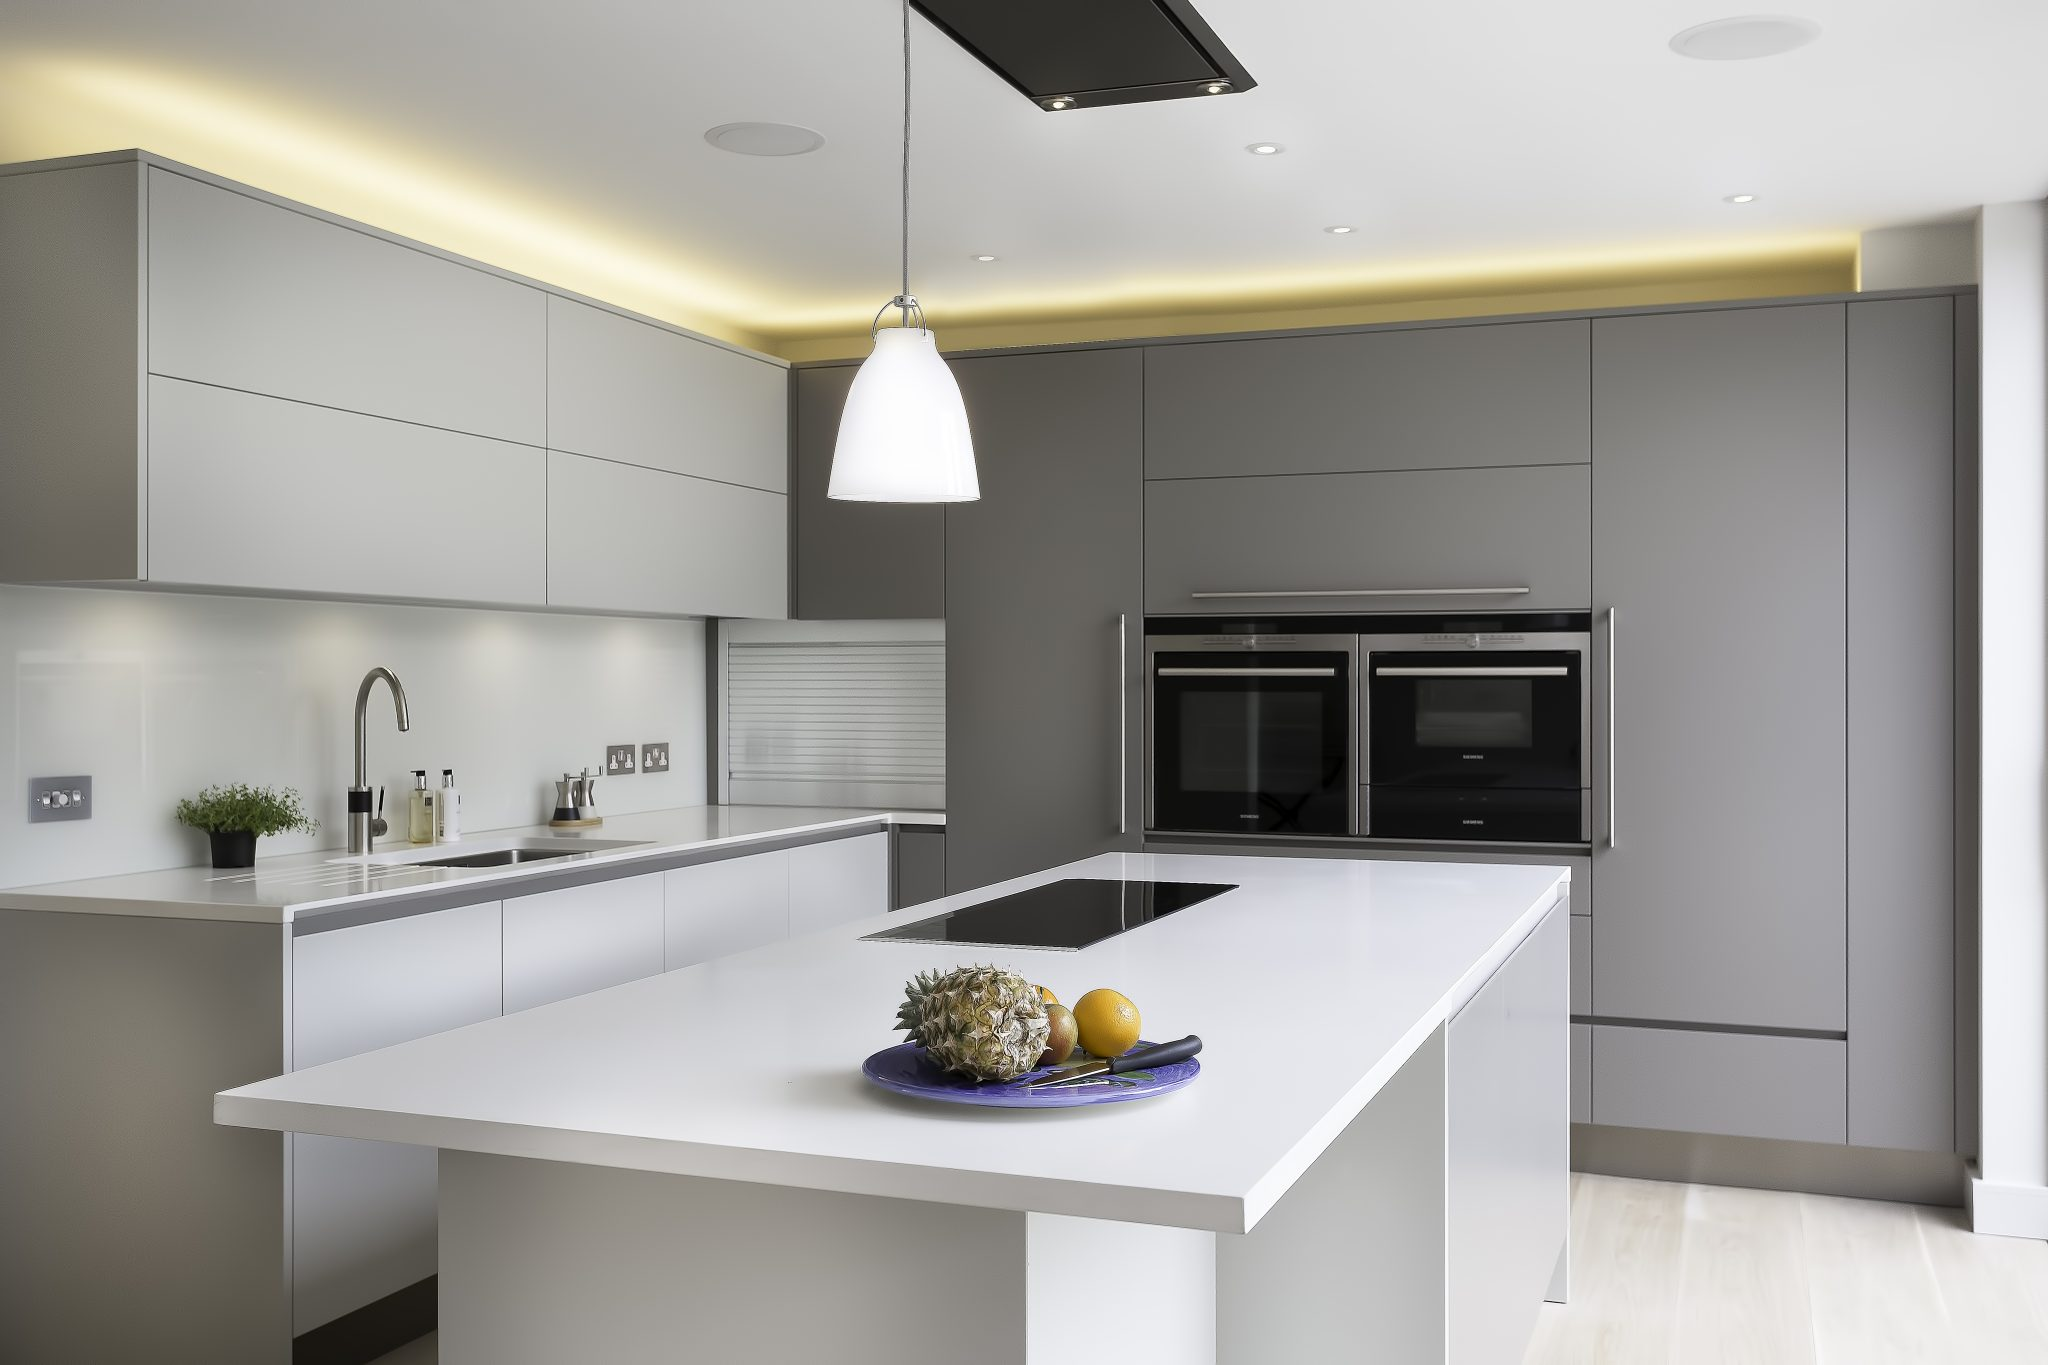 Kitchen landscape